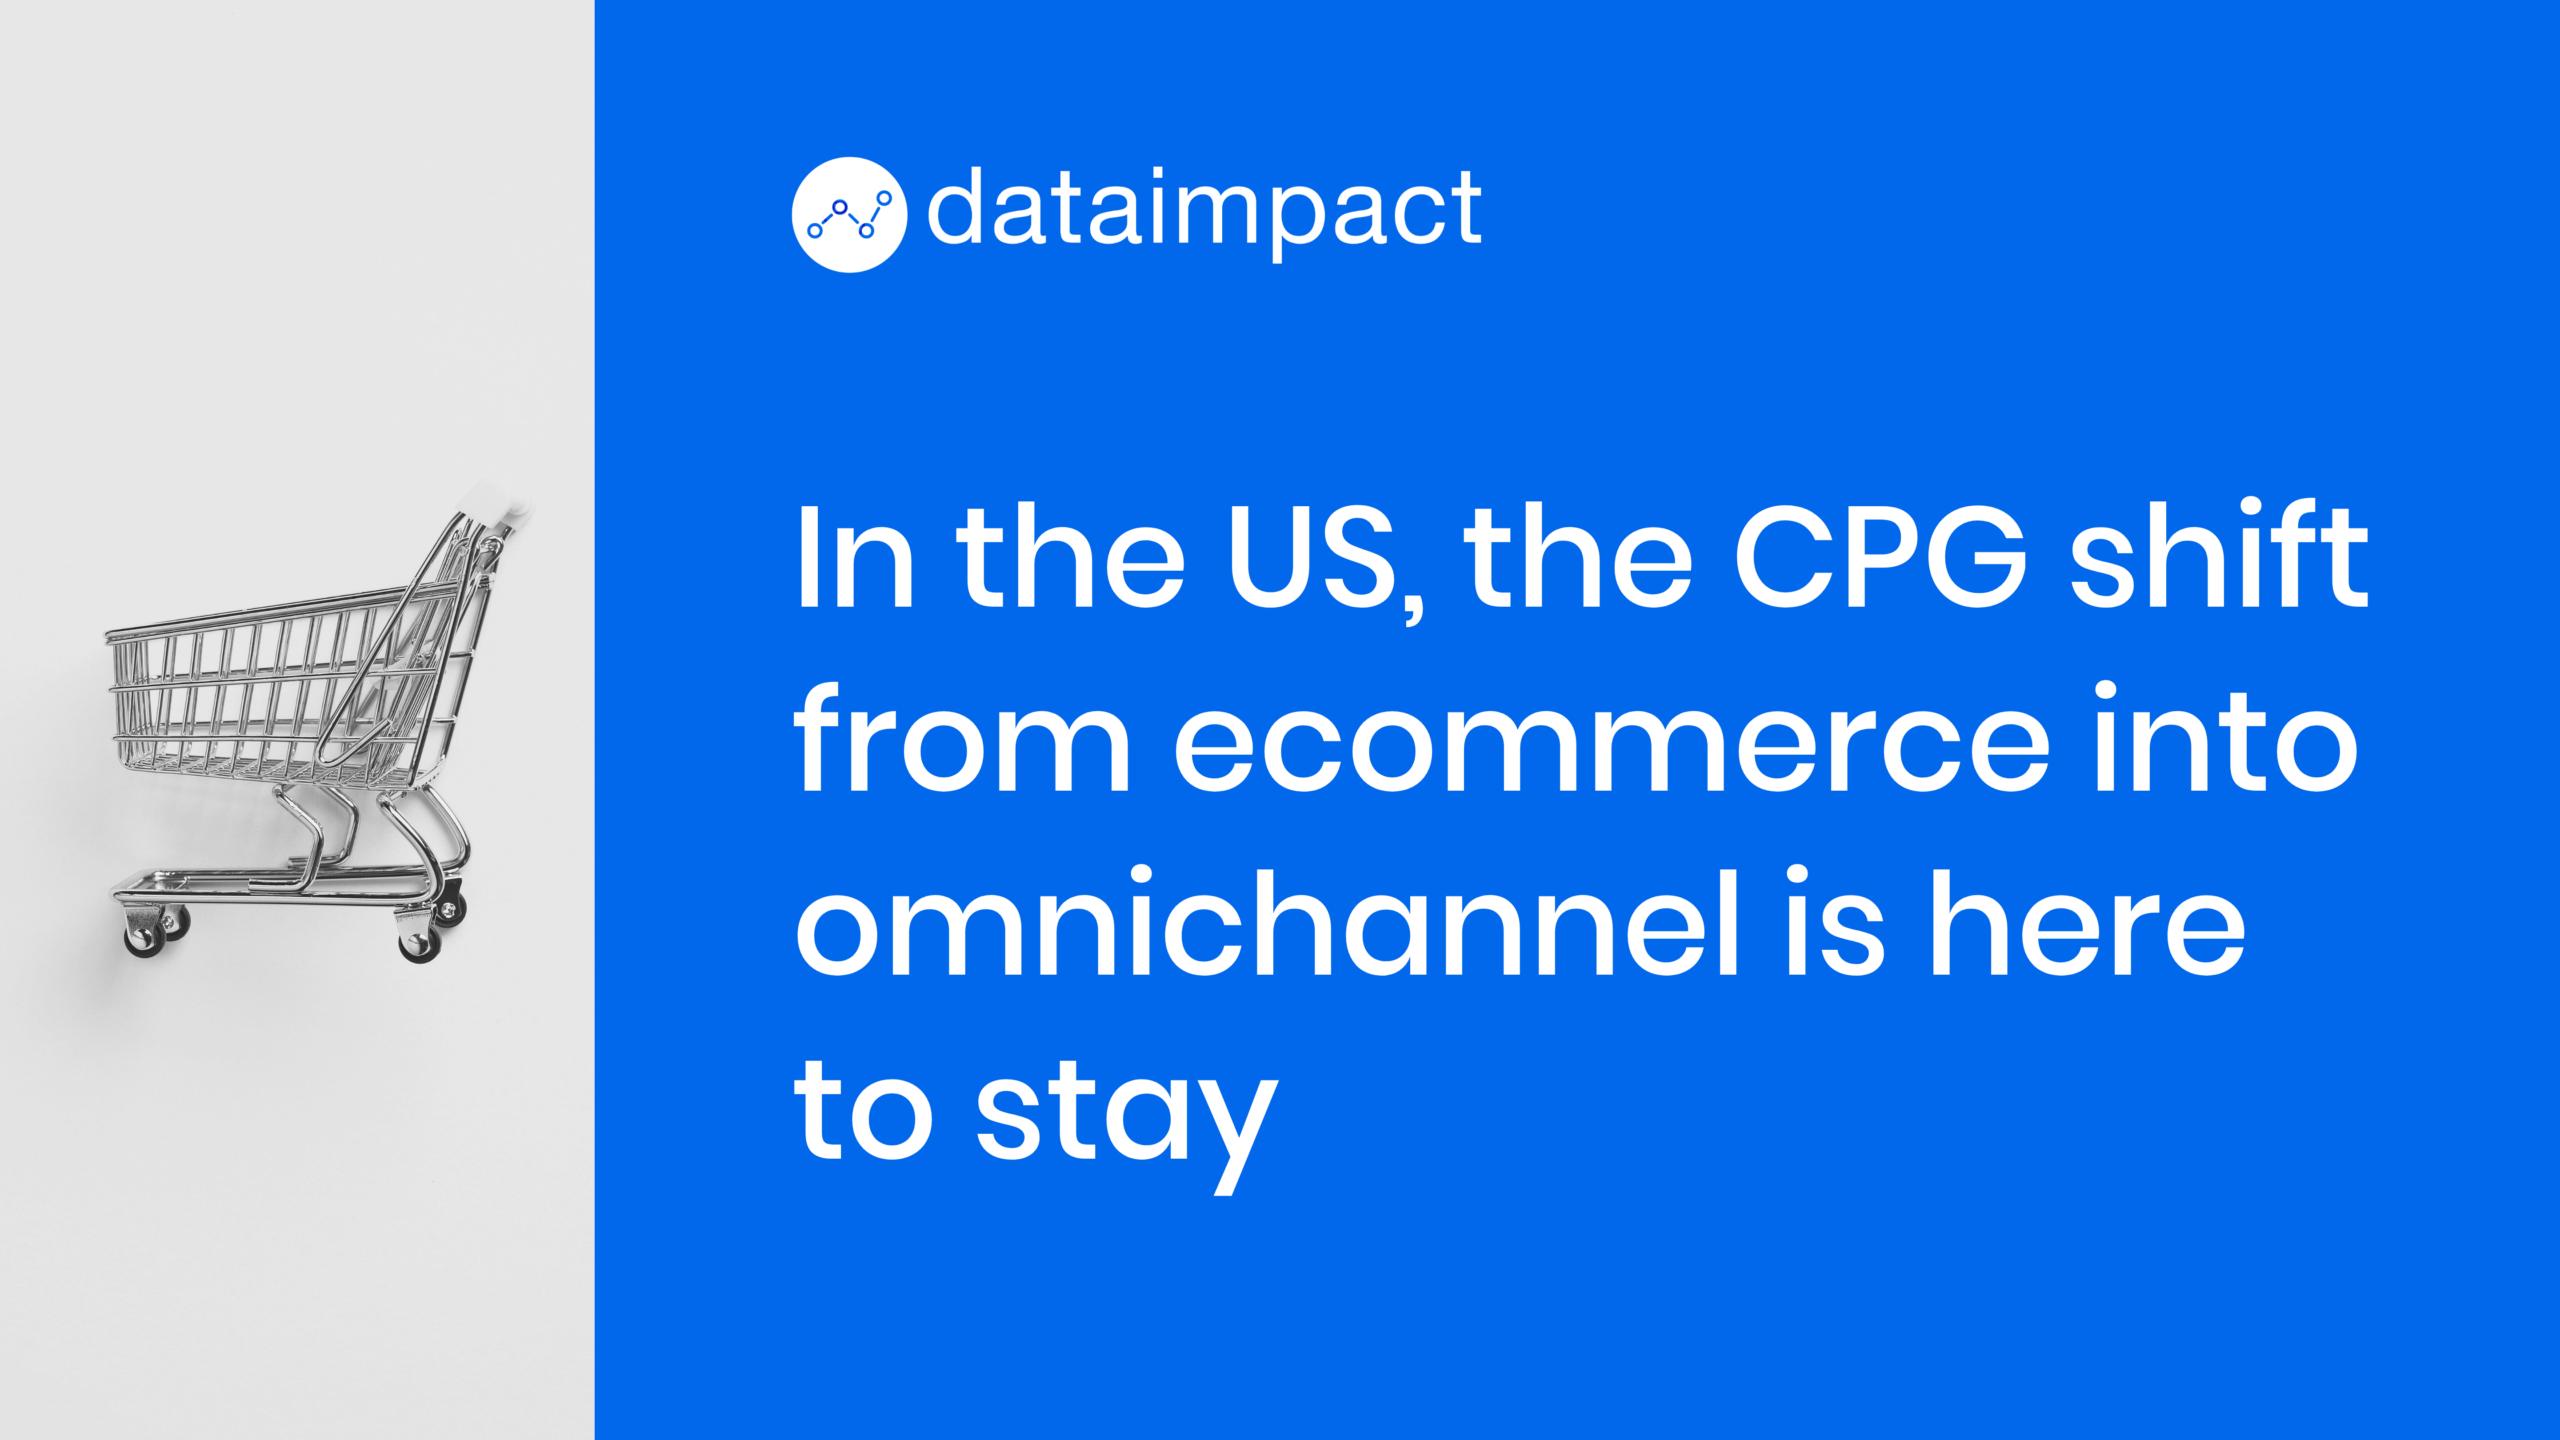 CPG shift ecommerce omnichannel US